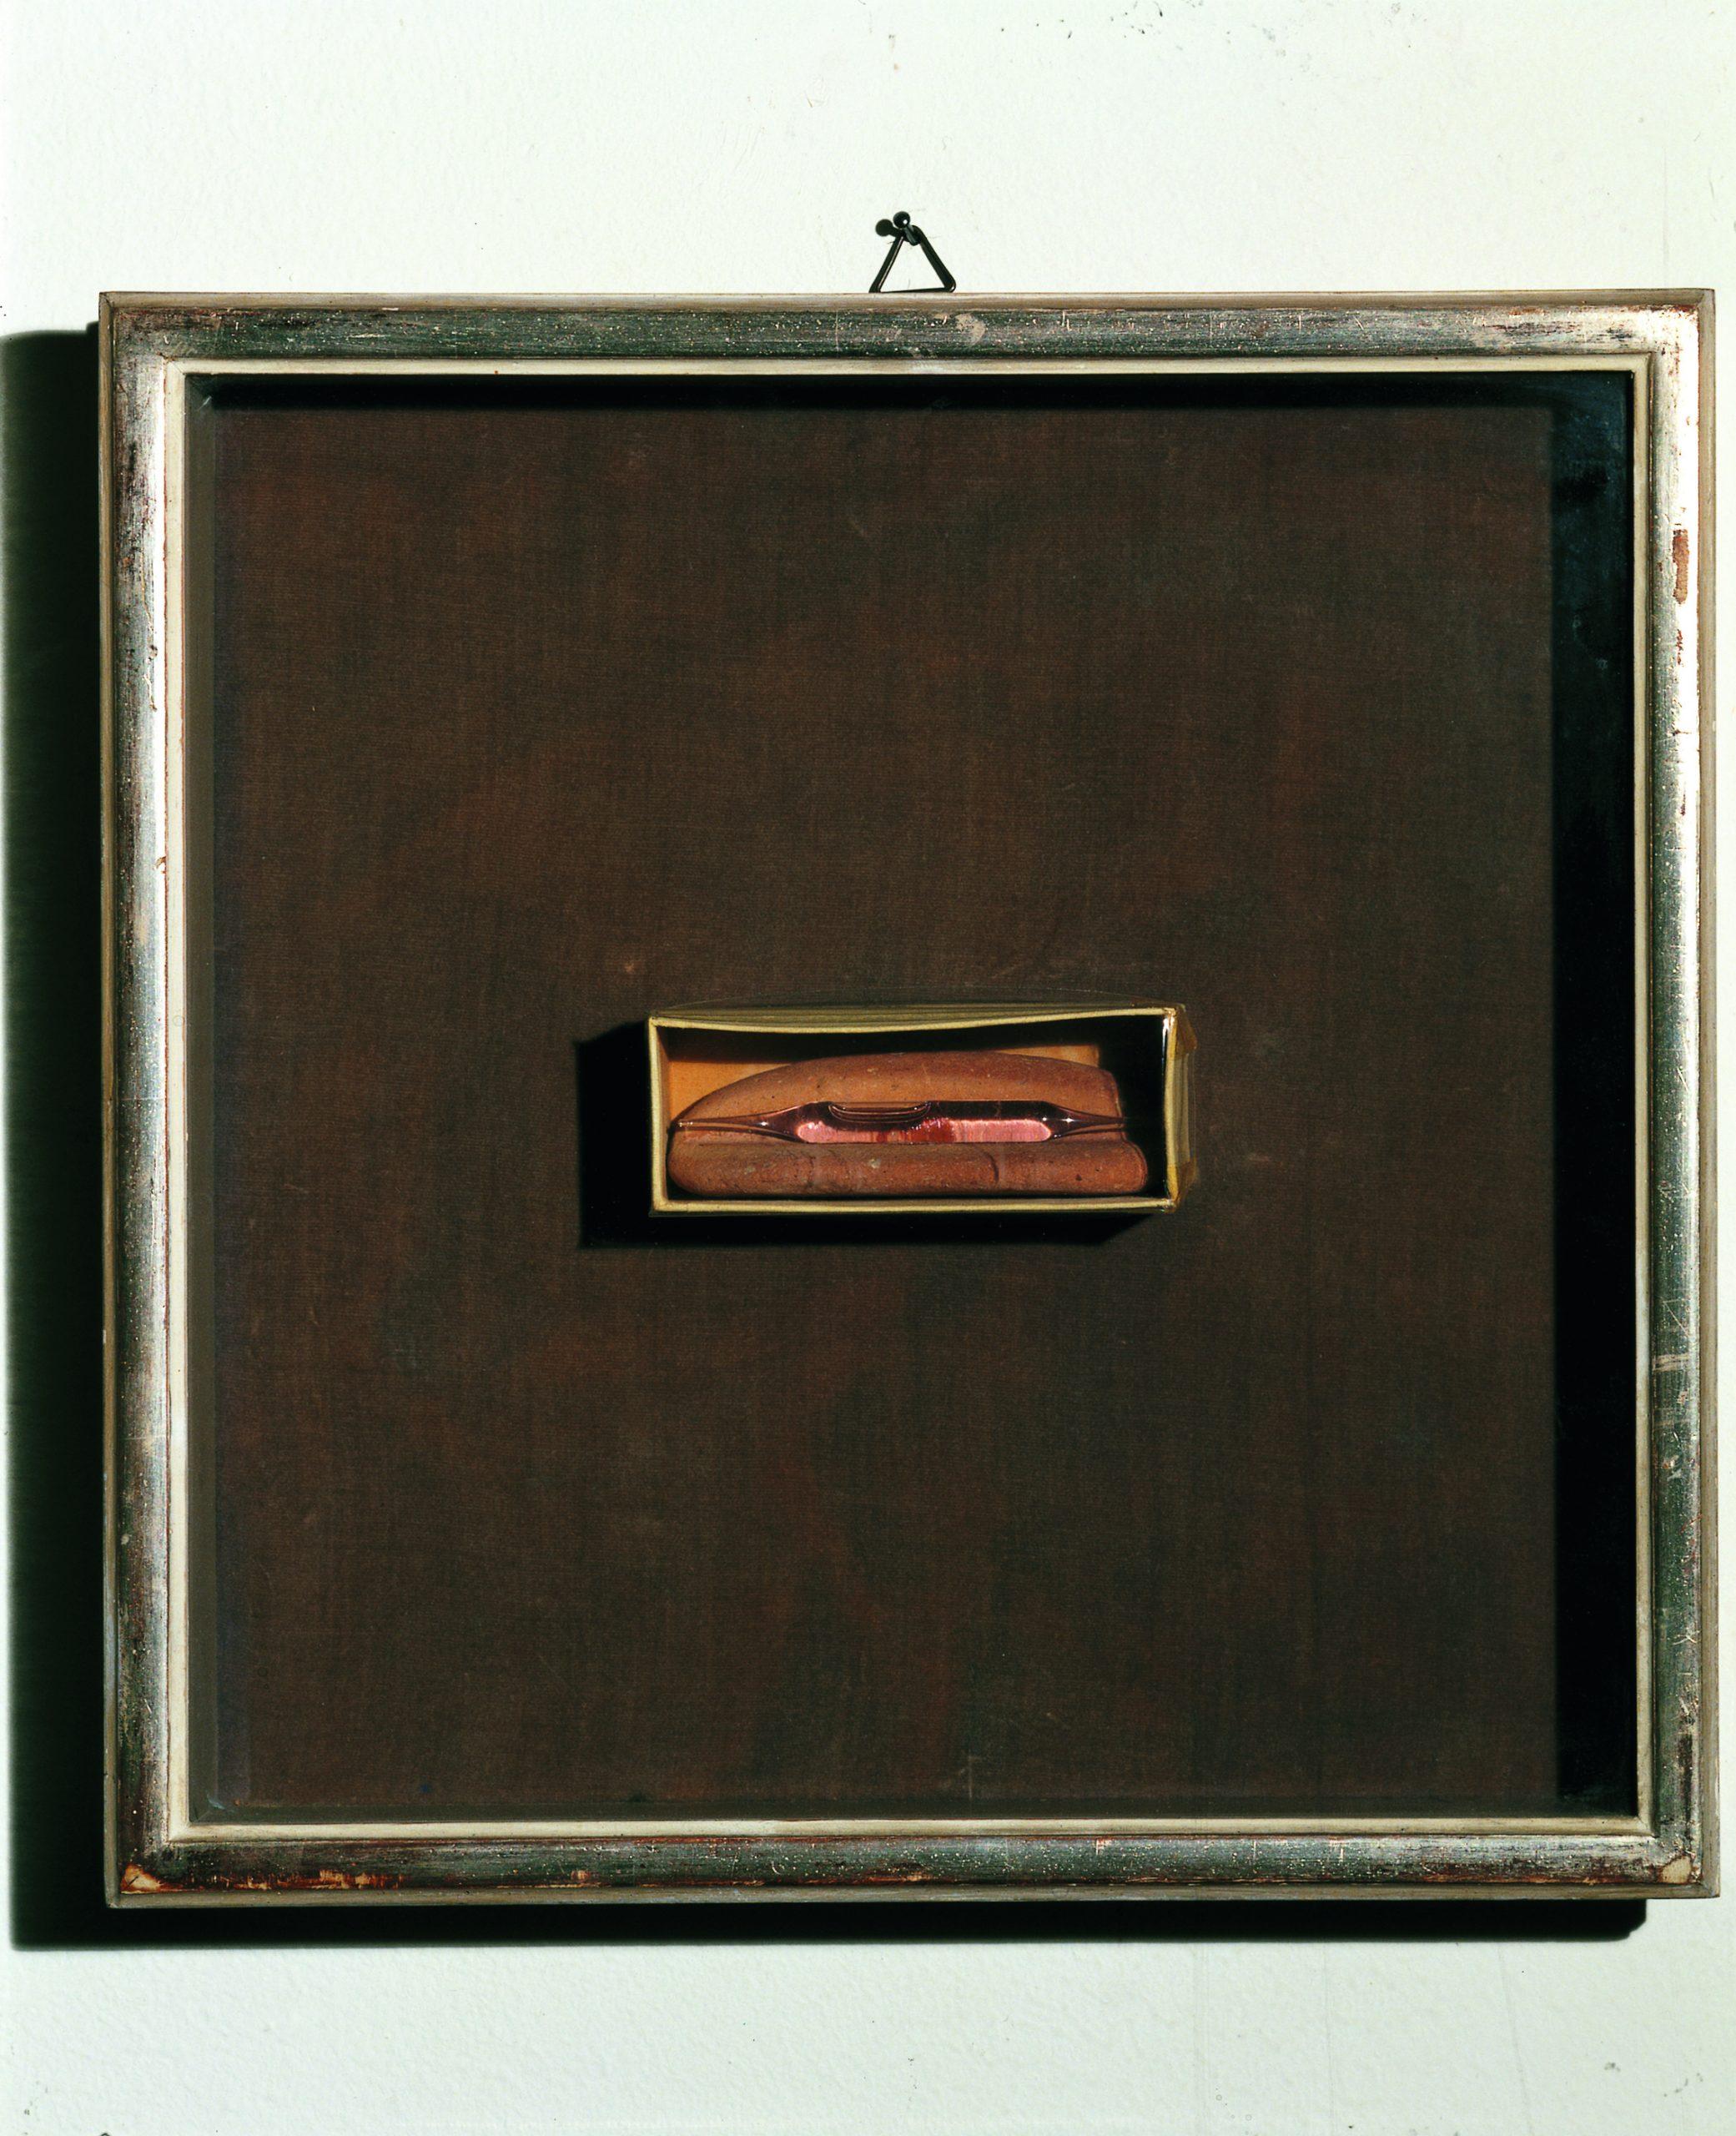 Man Ray's Pandora's Box, 1963